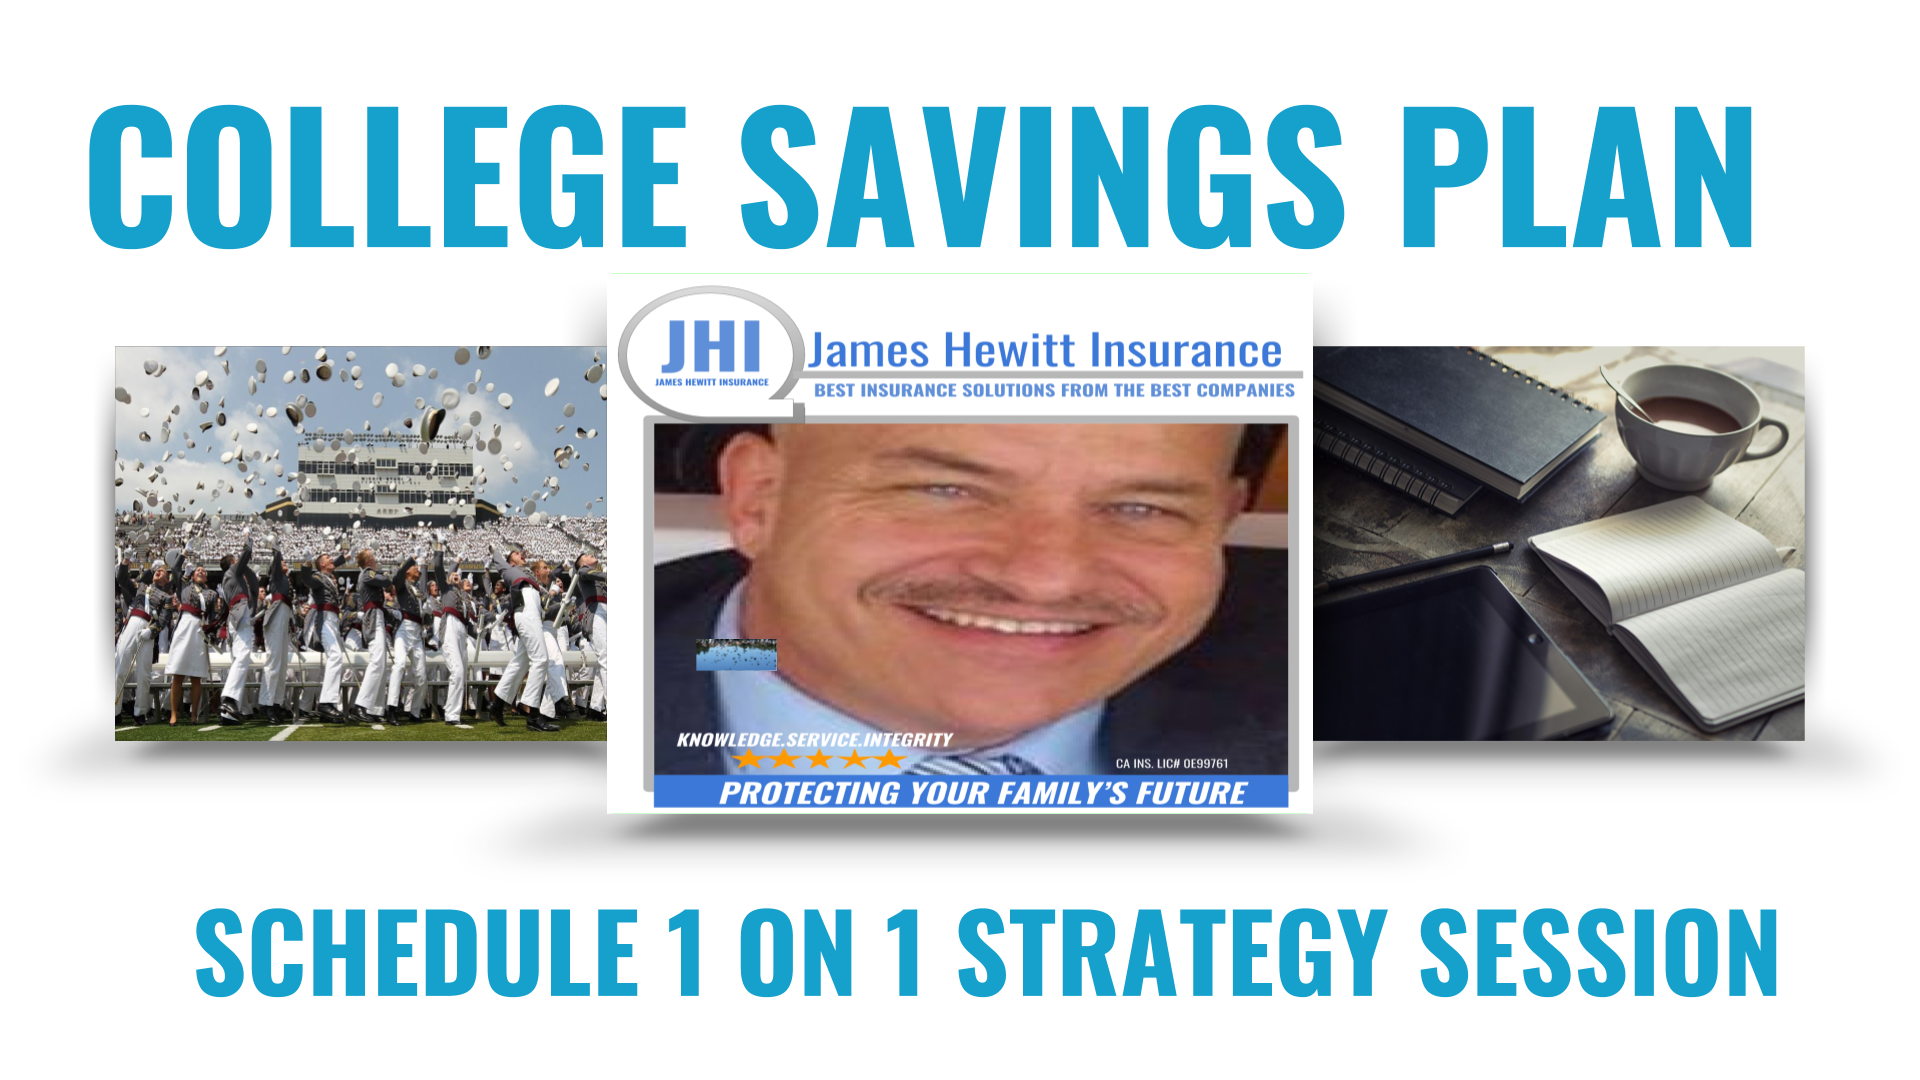 James Hewitt Insurance image 16